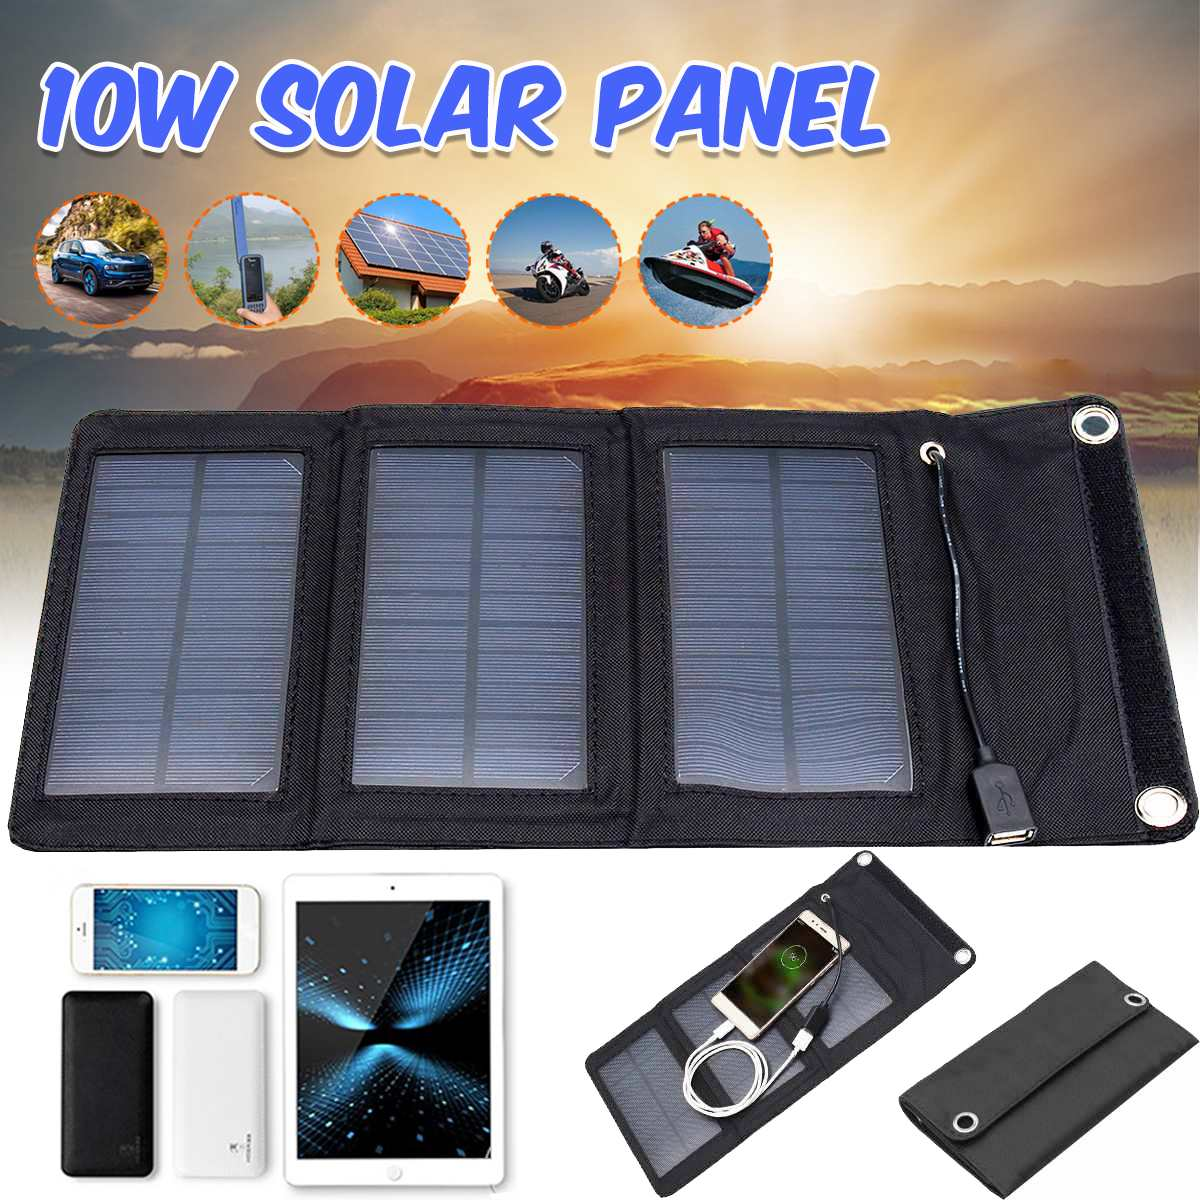 Cargador de Panel Solar plegable de 10W 5V Panel Solar plegable cargador de energía a prueba de agua banco de energía móvil para batería de teléfono puerto USB